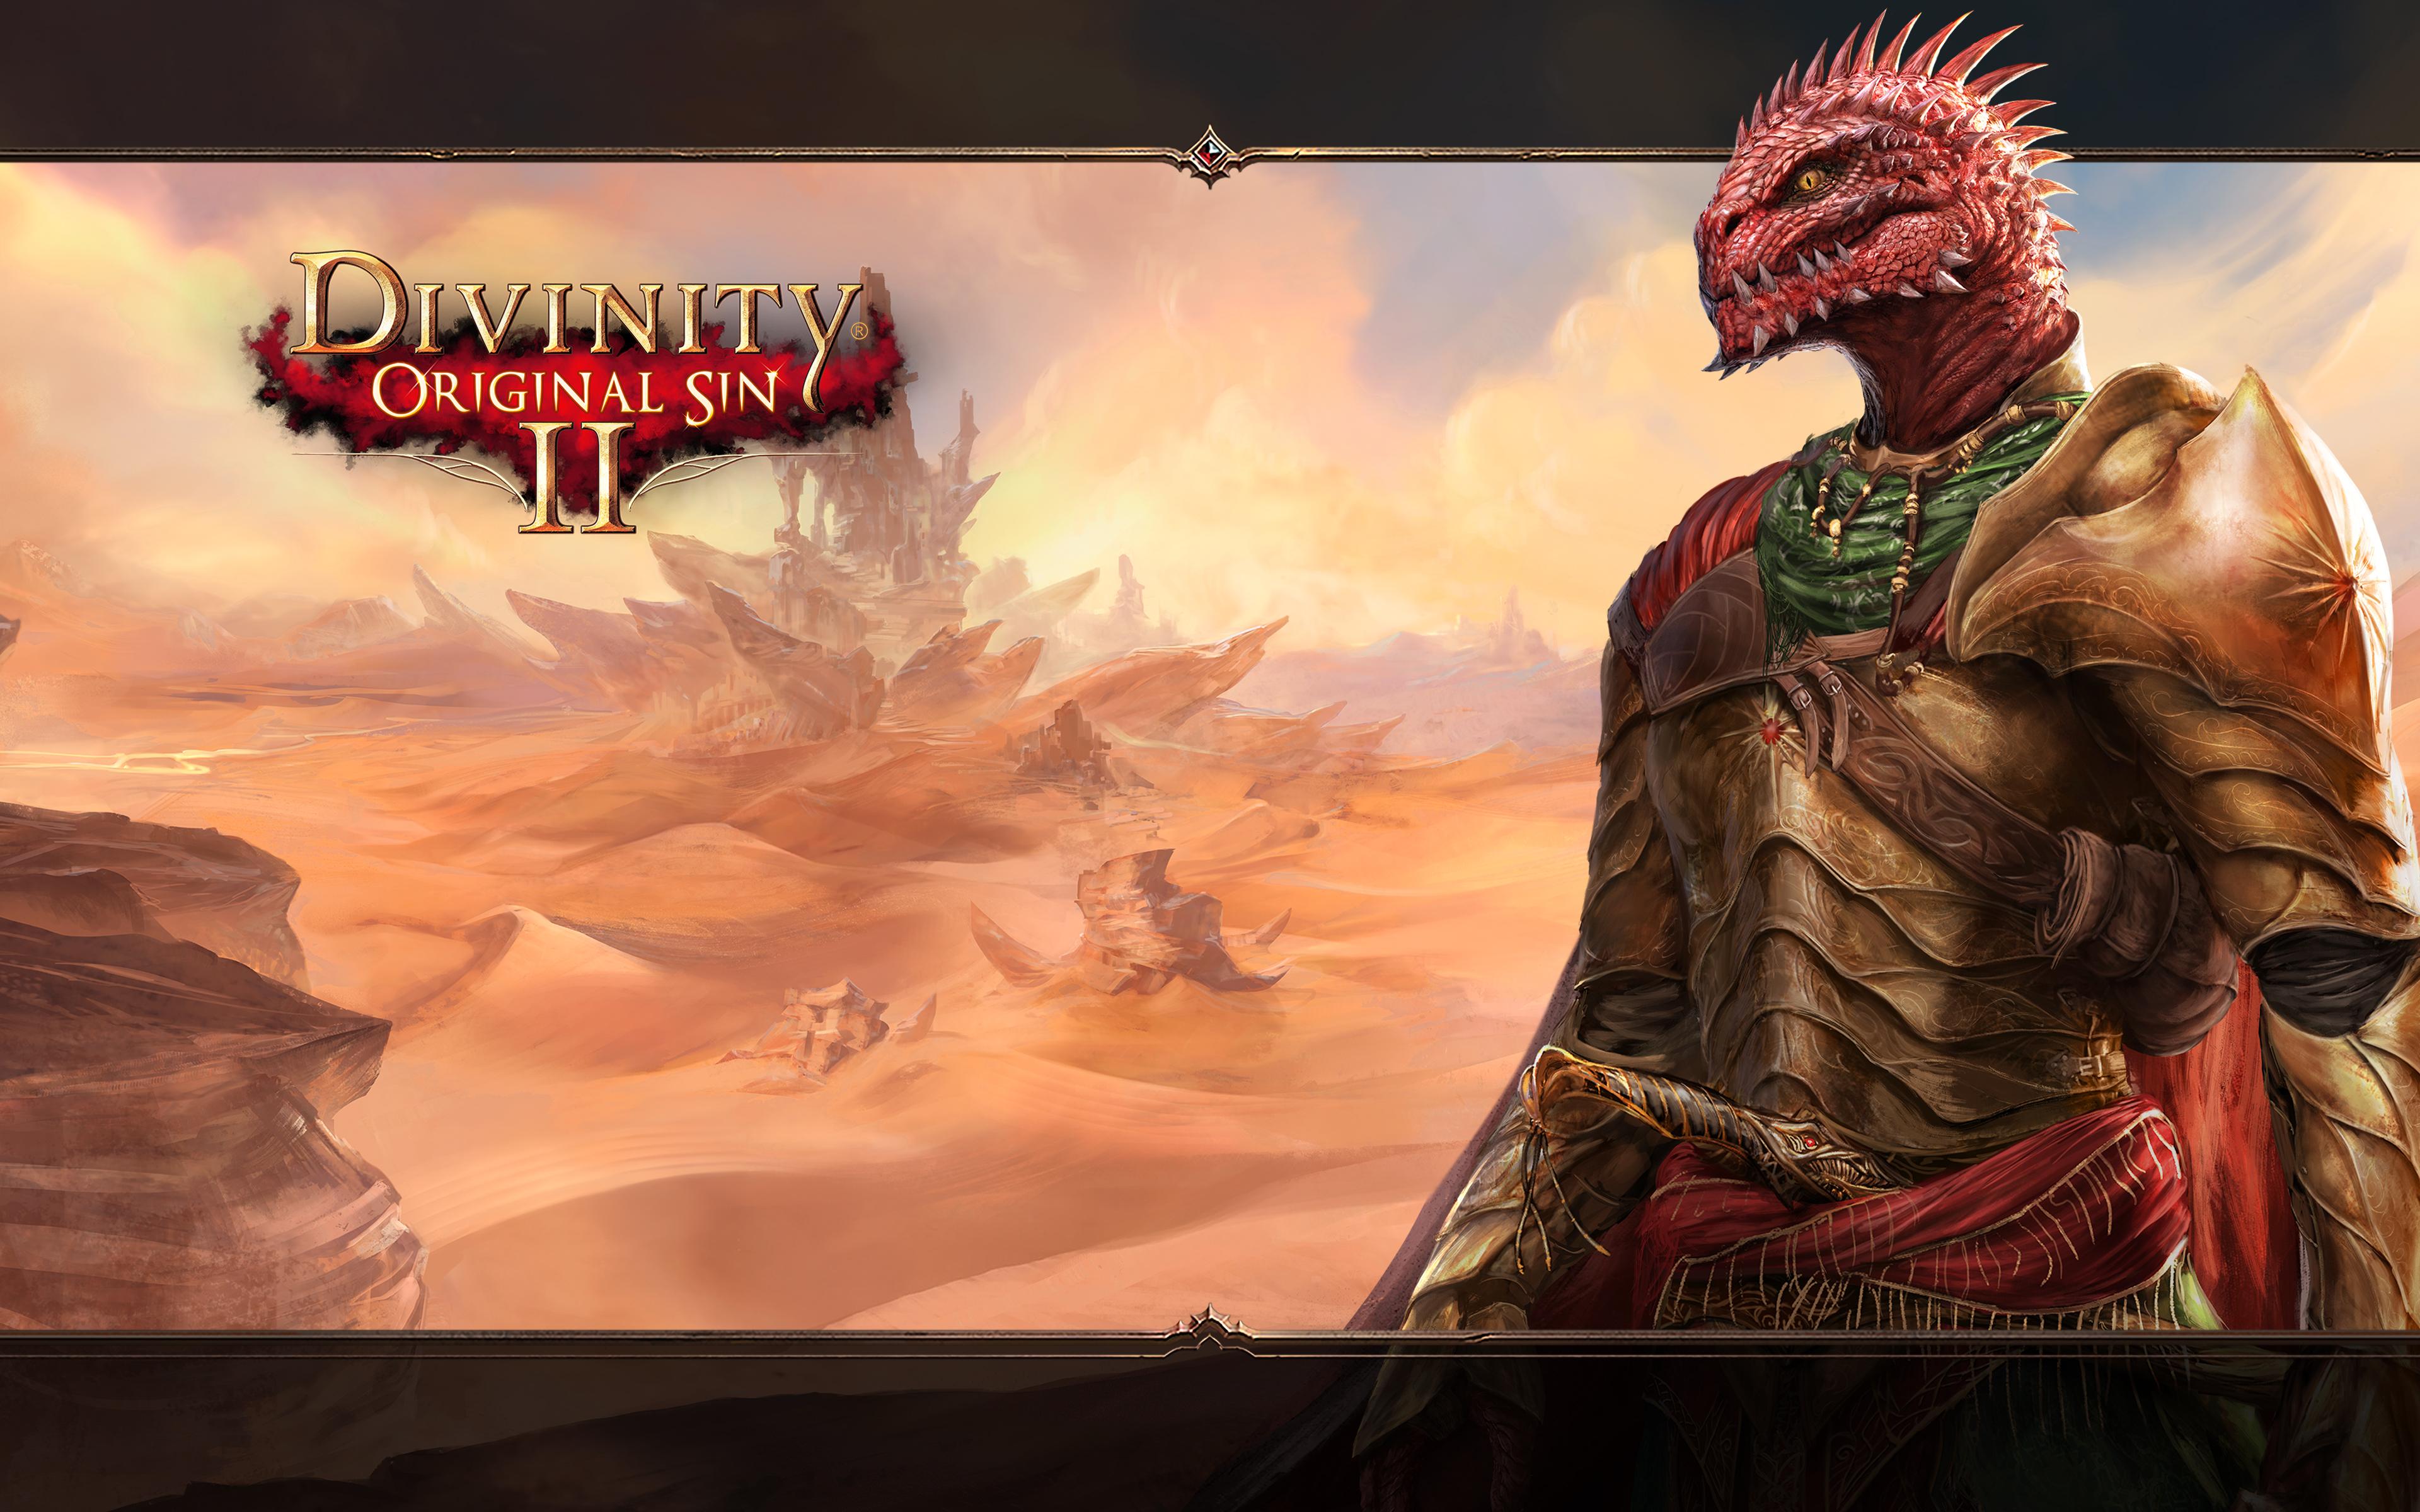 19 Divinity Original Sin Ii Hd Wallpapers Background Images